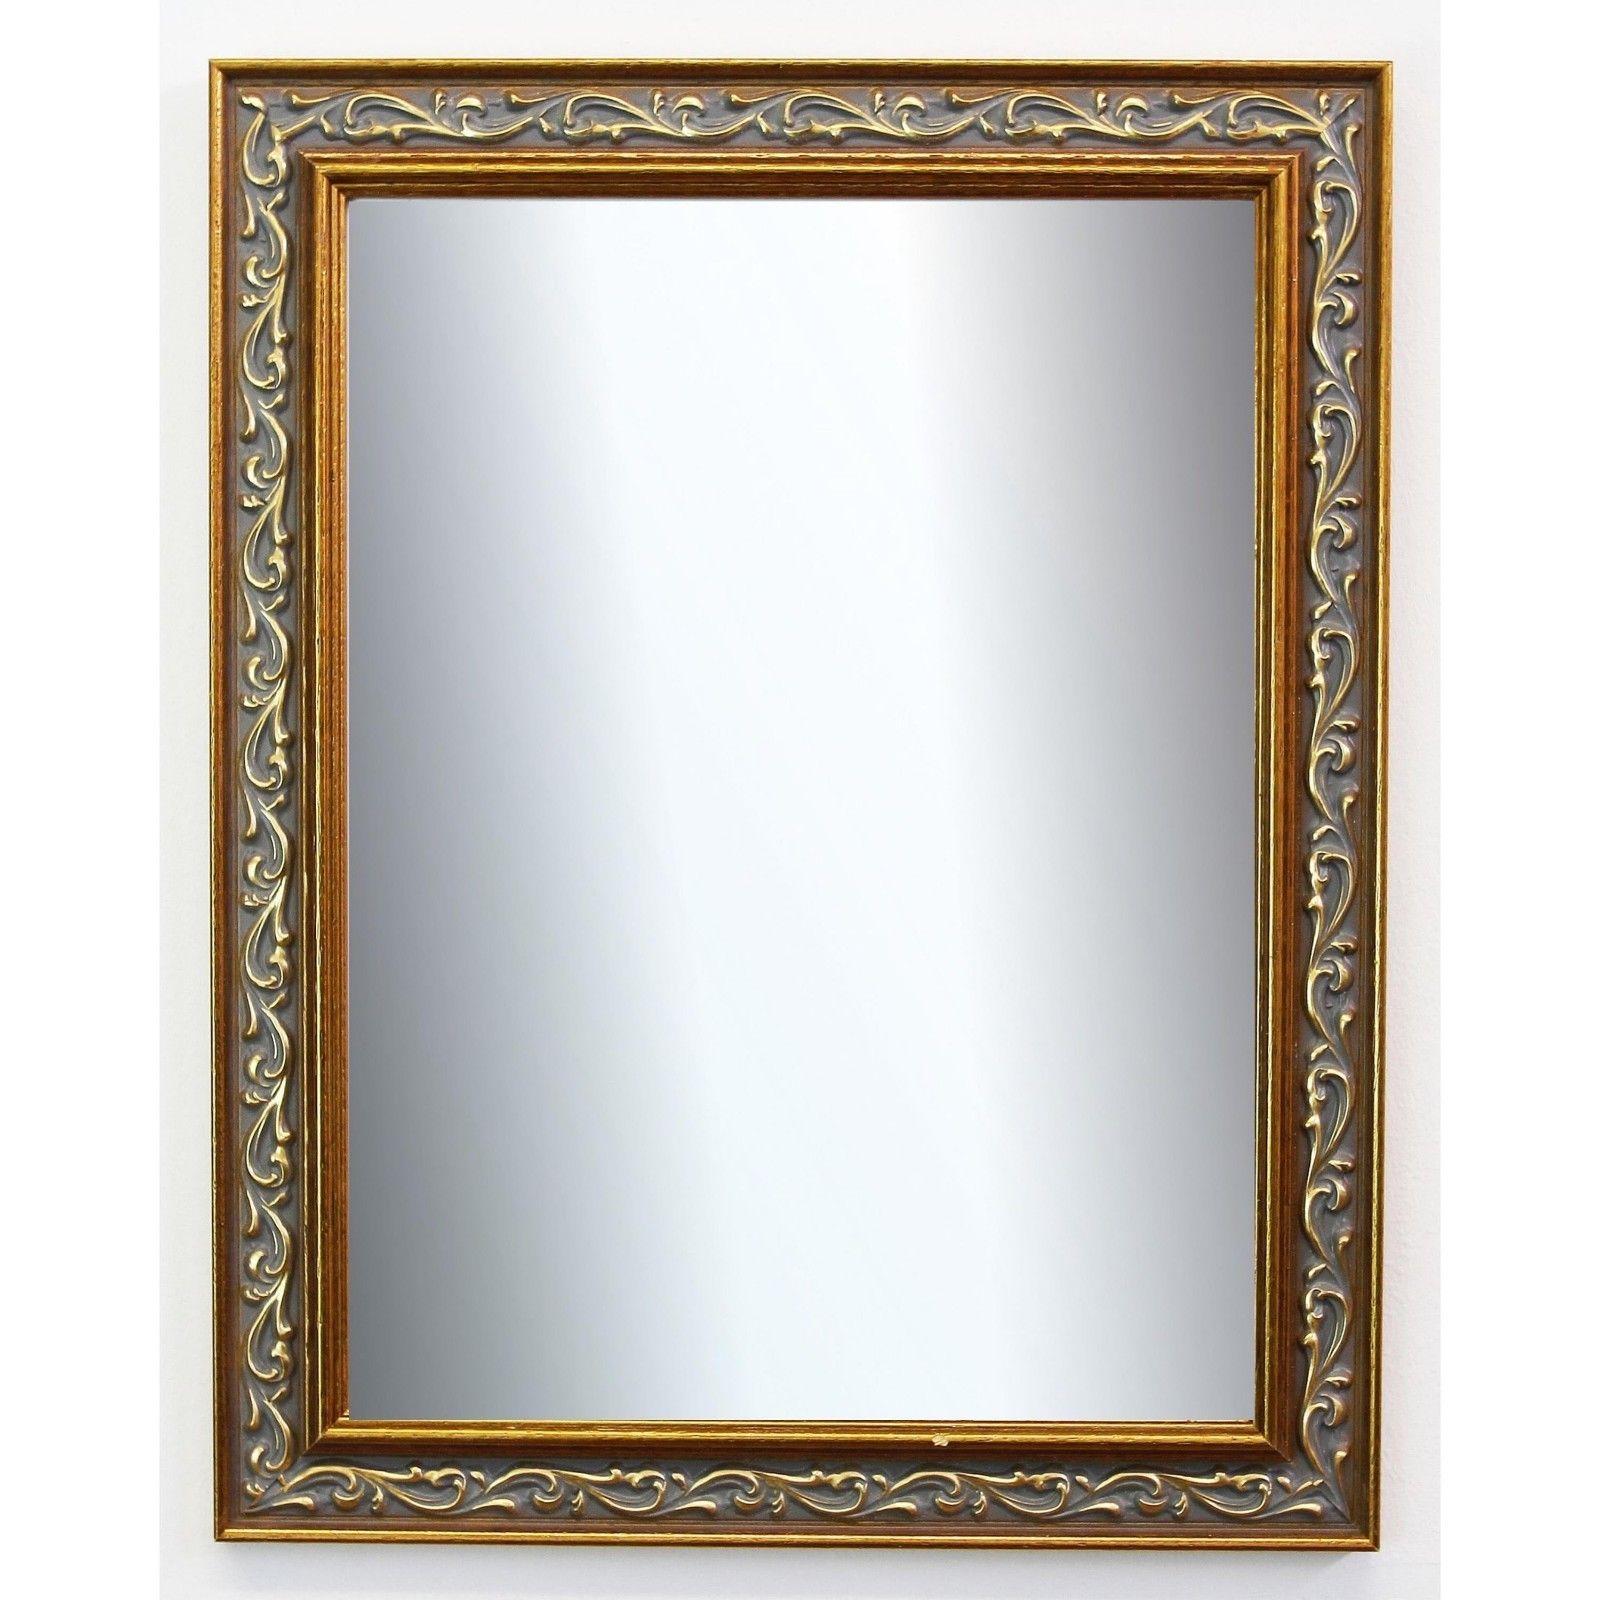 Glamorous Flur Grau Photo Of Spiegel Wandspiegel Badspiegel Antik Barock Vintage Verona